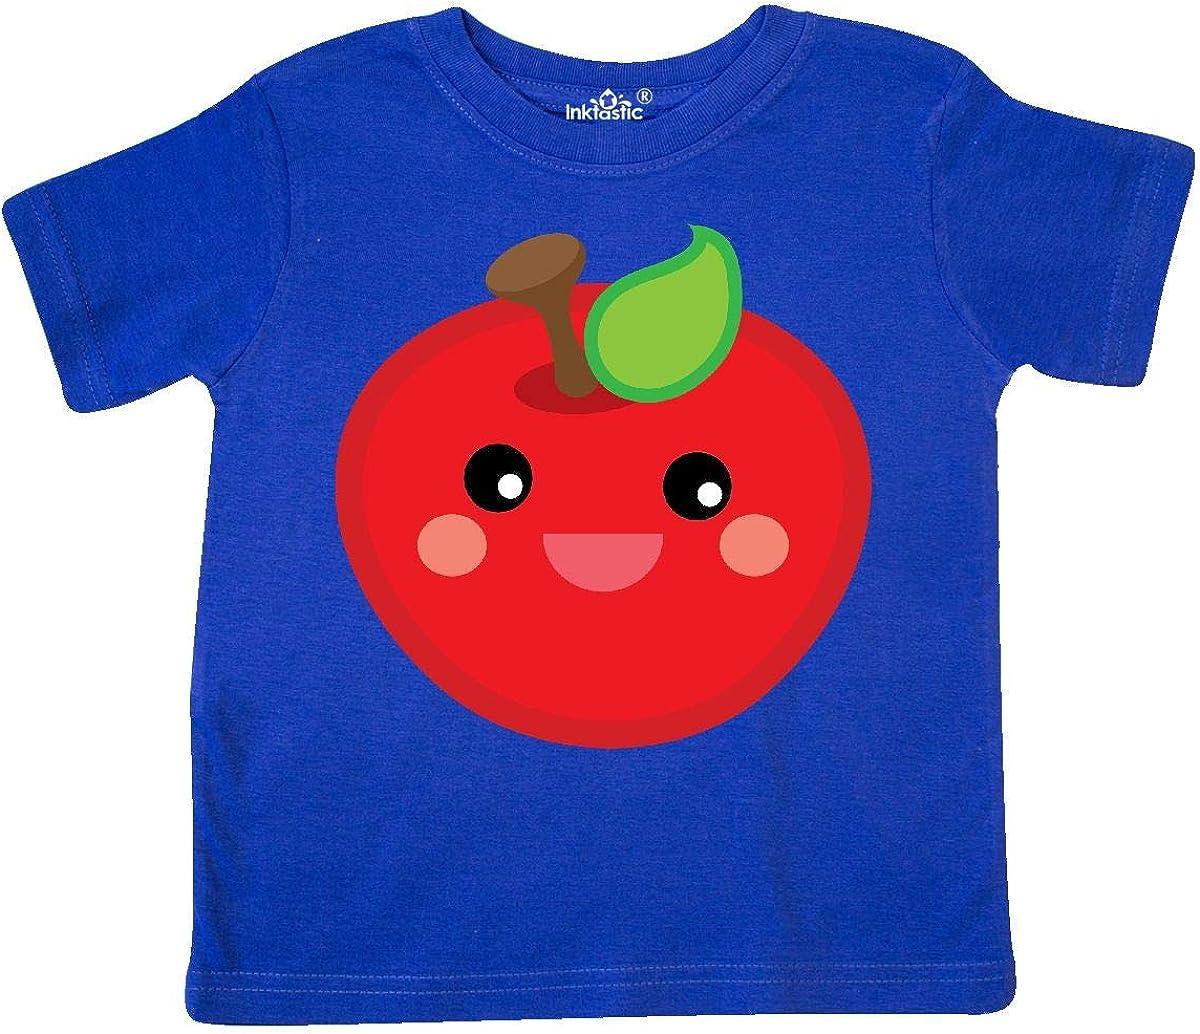 inktastic Smiling Apple Toddler T-Shirt